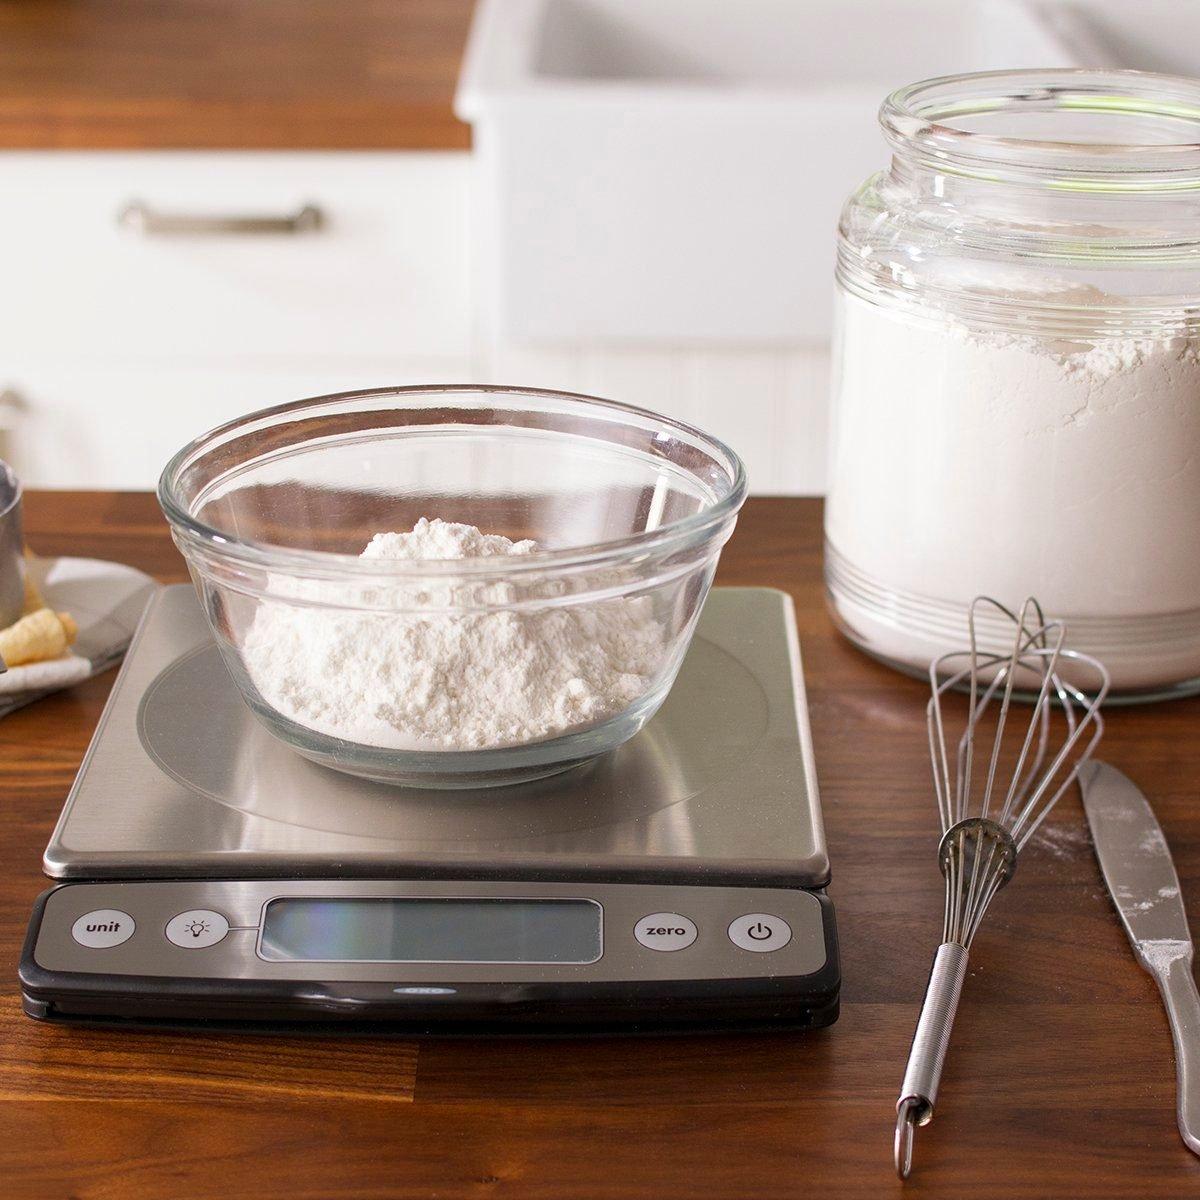 flour on a kitchen scale